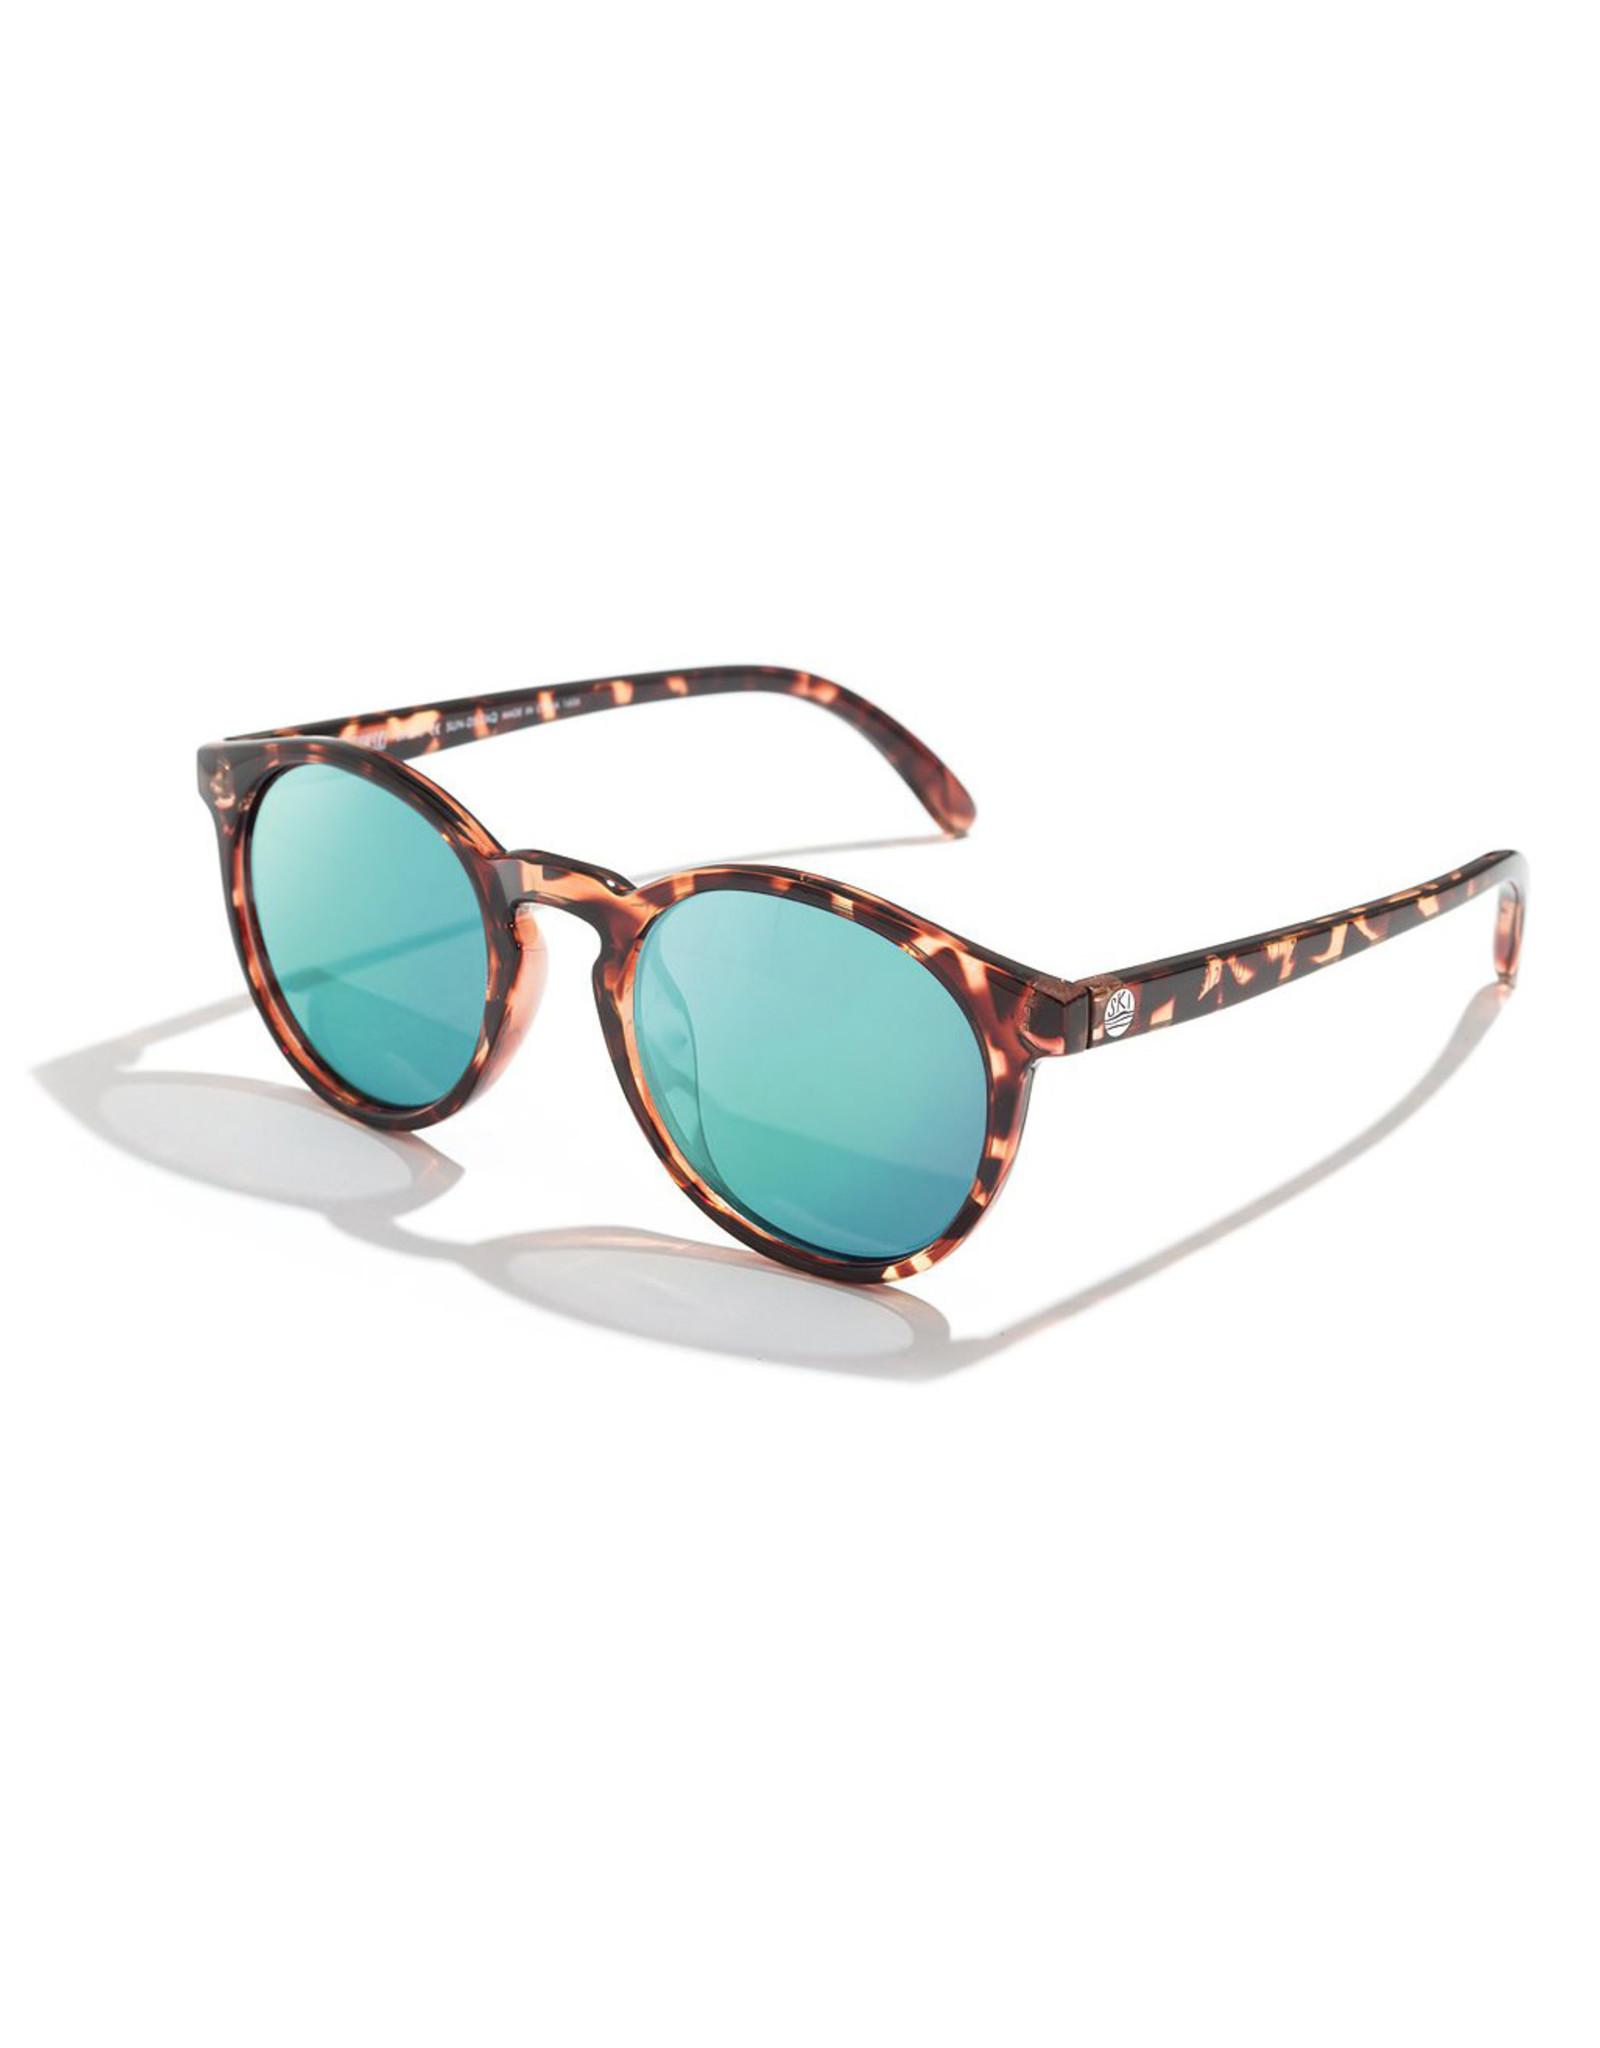 Sunski Dipsea Sunglasses Tortoise Emerald